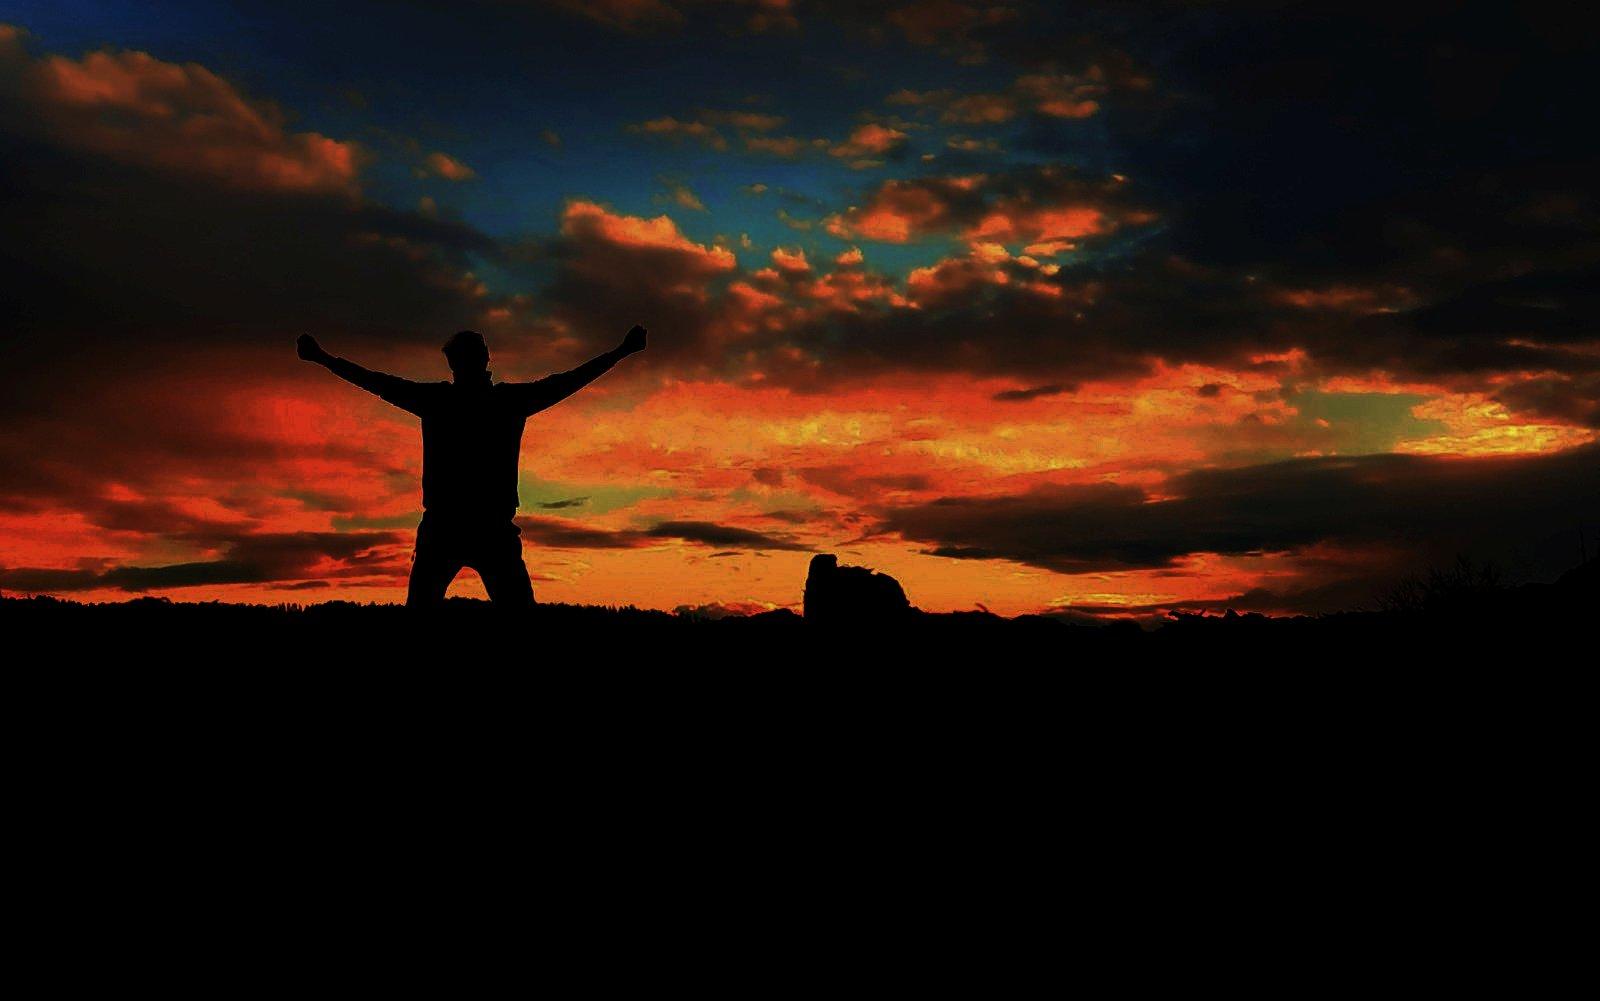 modlitebník, orant, silueta, obloha, mraky, nebe, temnota / foto -MP-